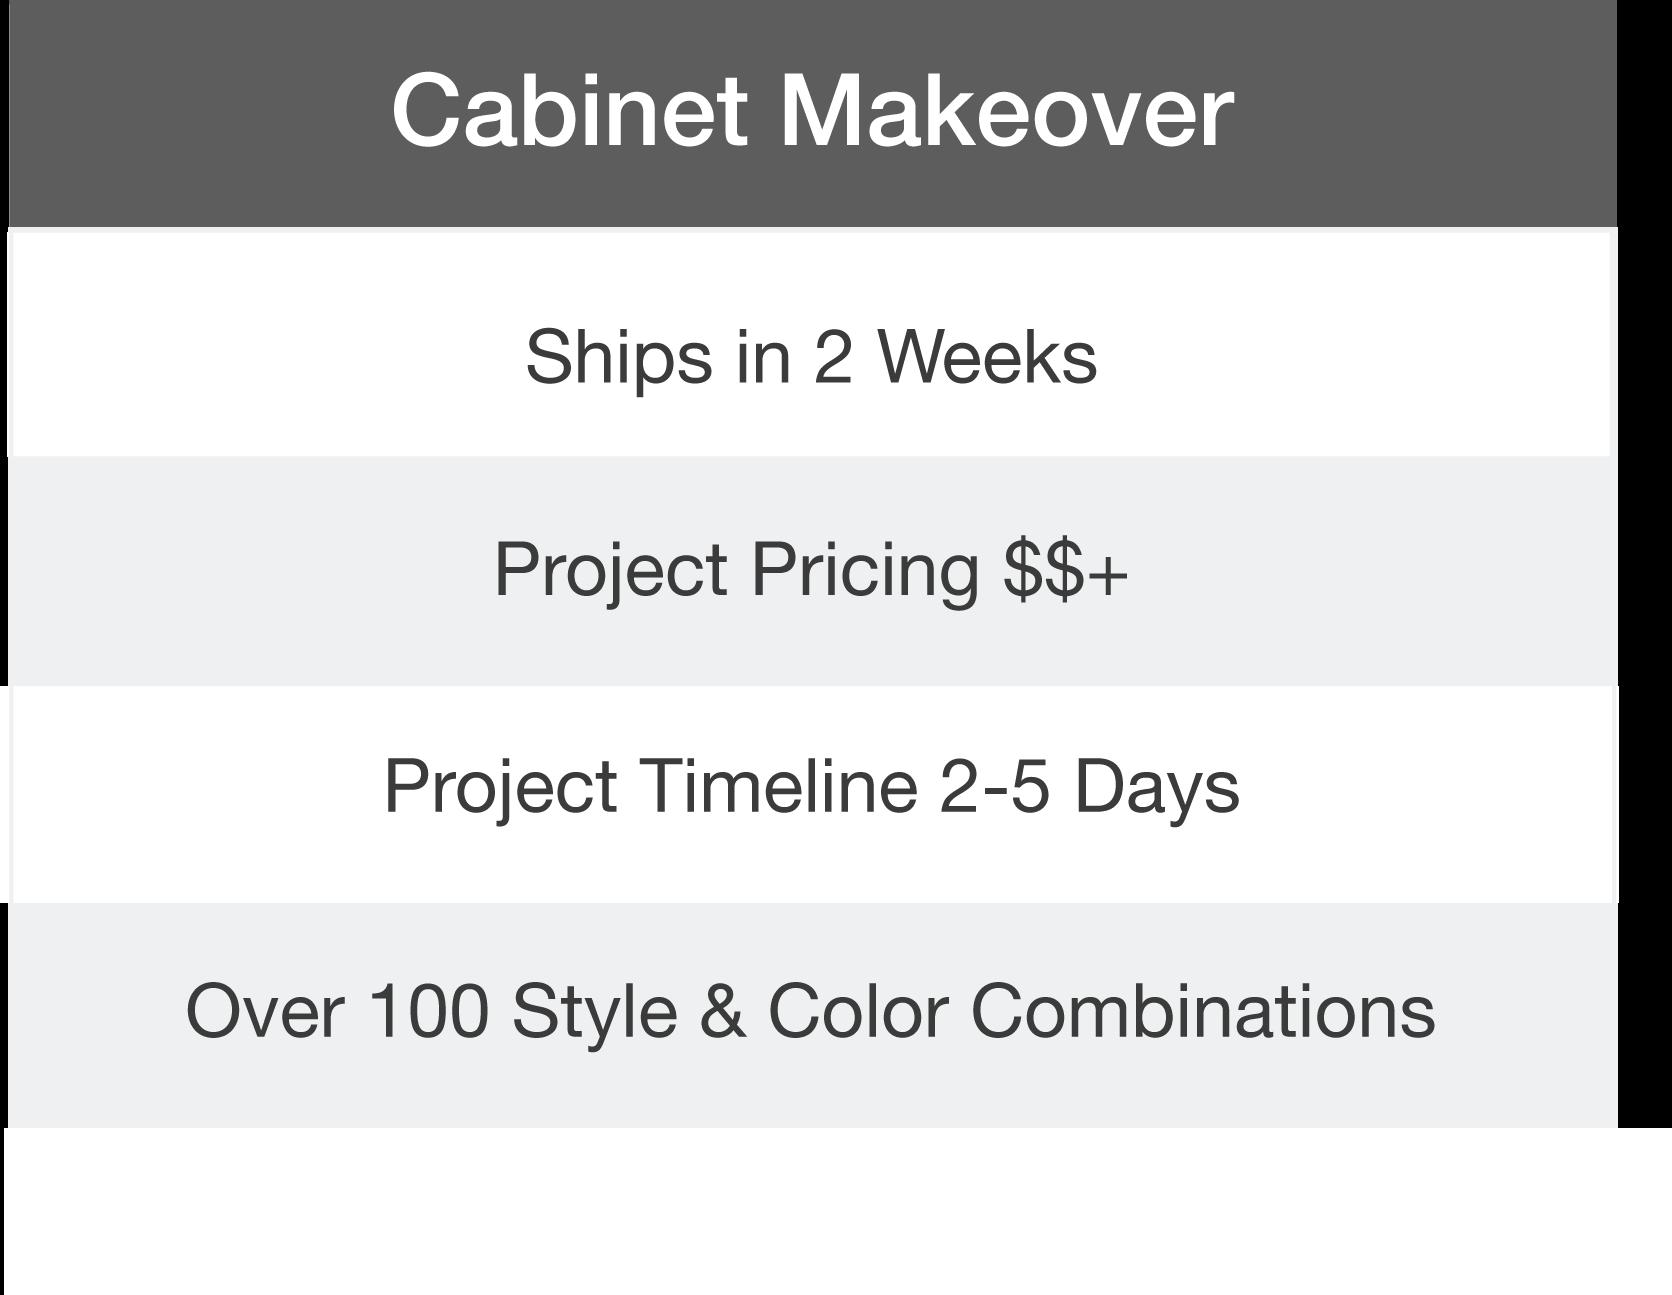 Kitchen cabinet makeover option